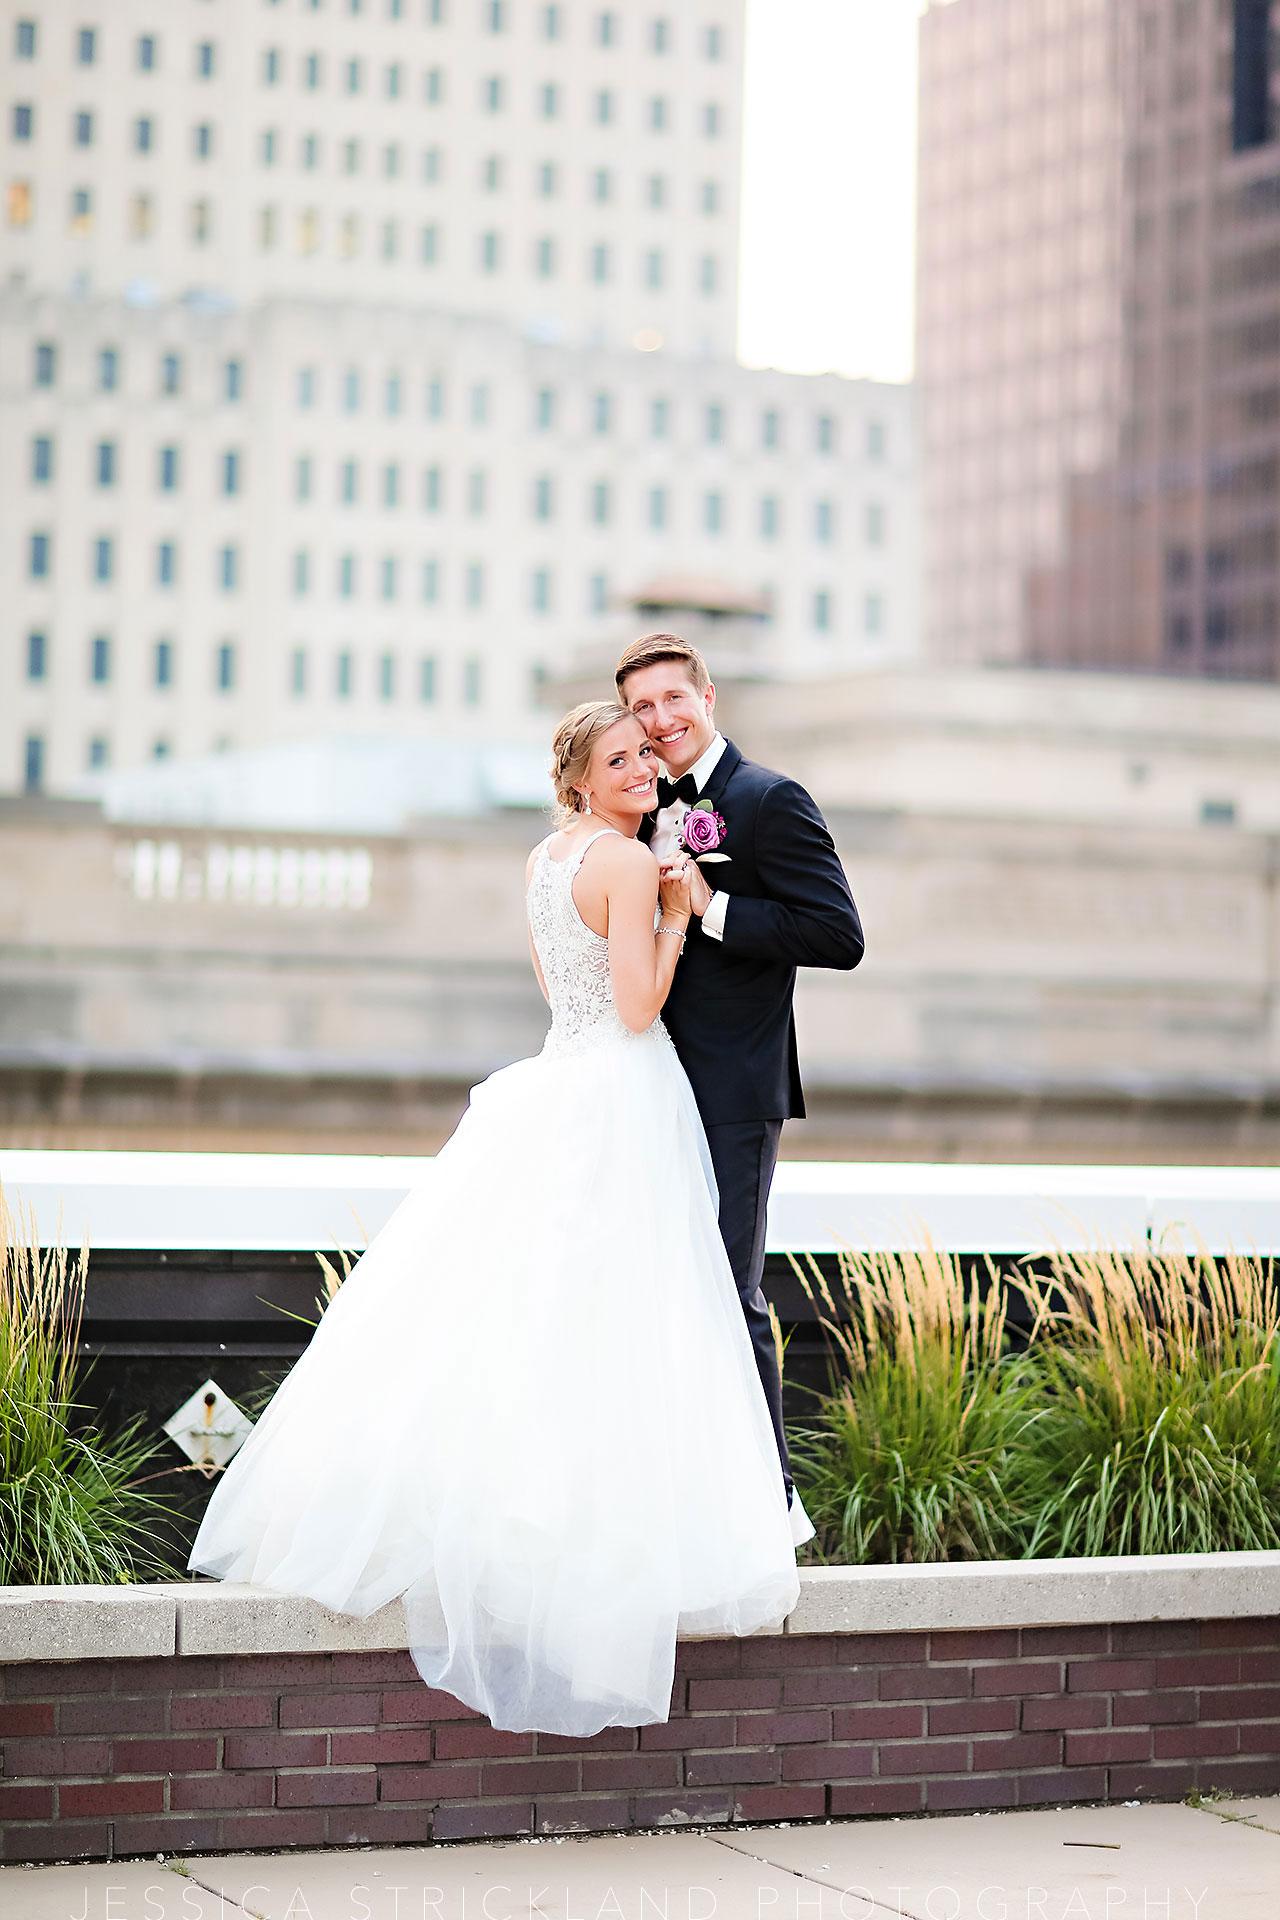 Serra Alex Regions Tower Indianapolis Wedding 336 watermarked